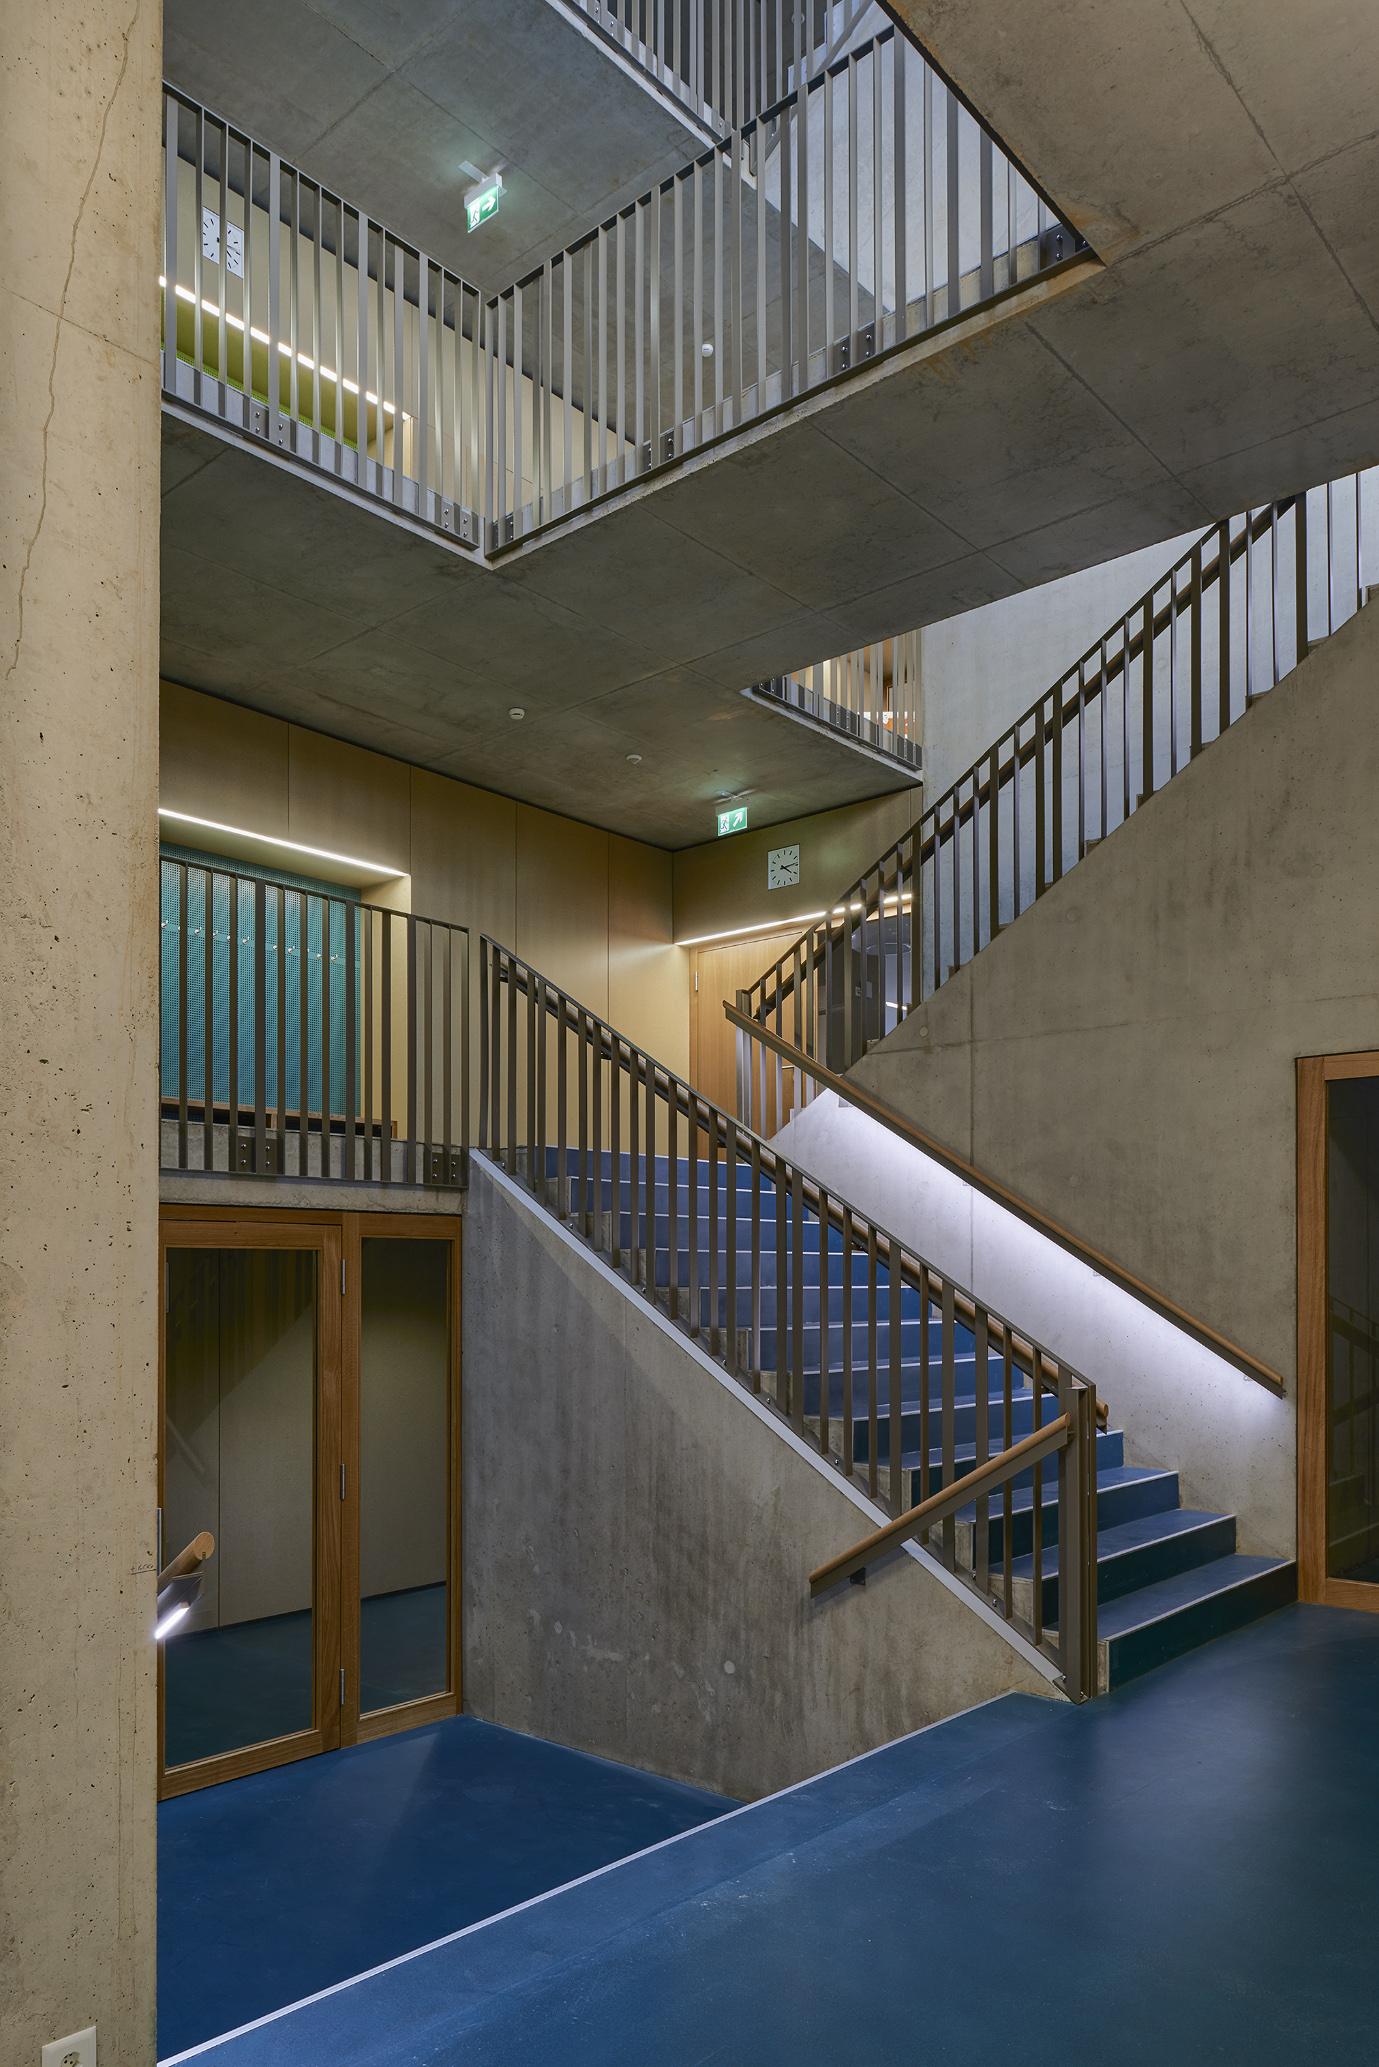 dettling péléraux architectes_003.jpg